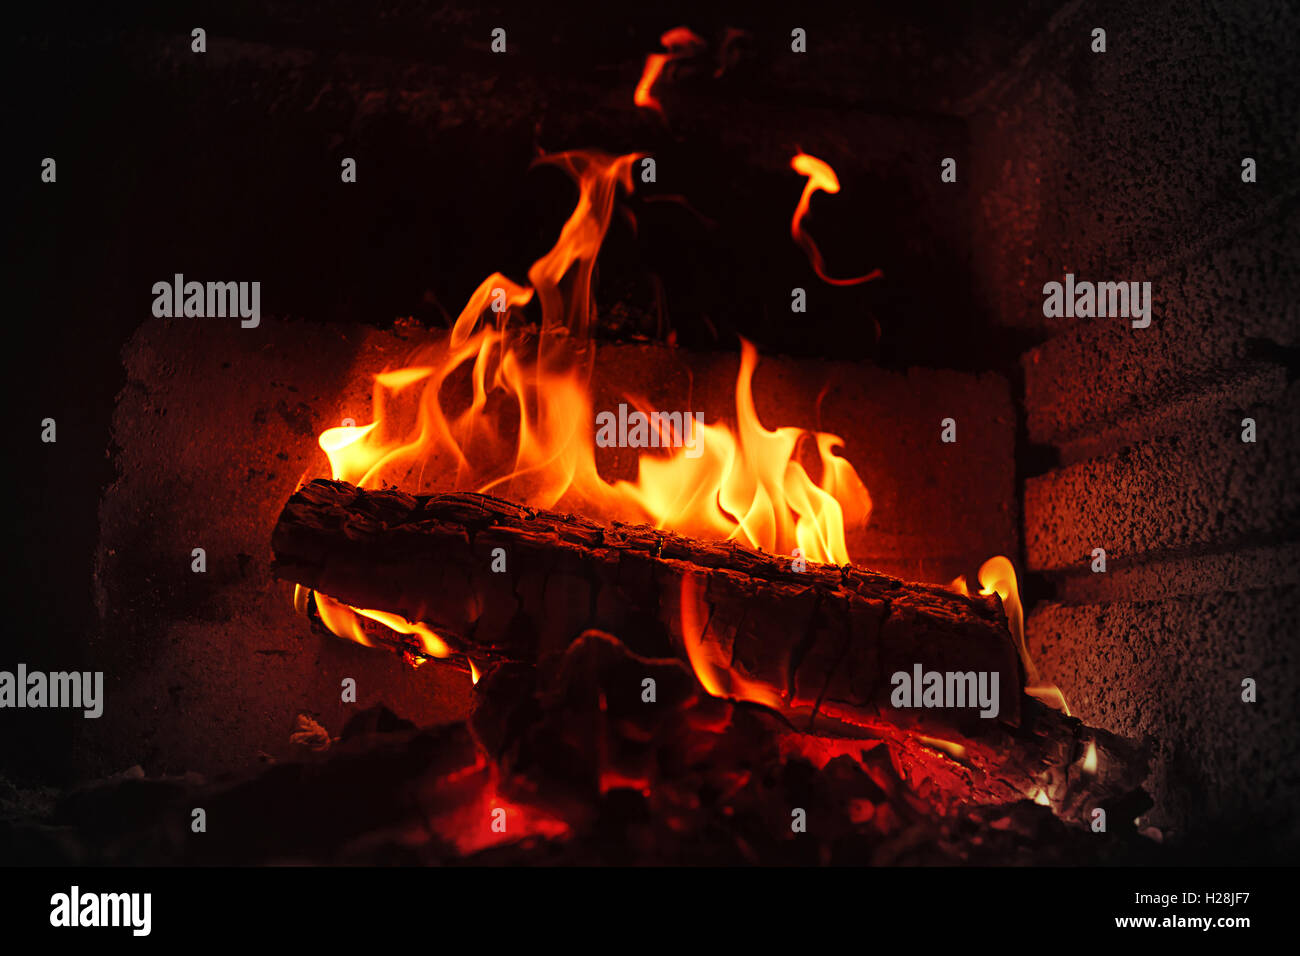 Burning wood in brick fireplace - Stock Image